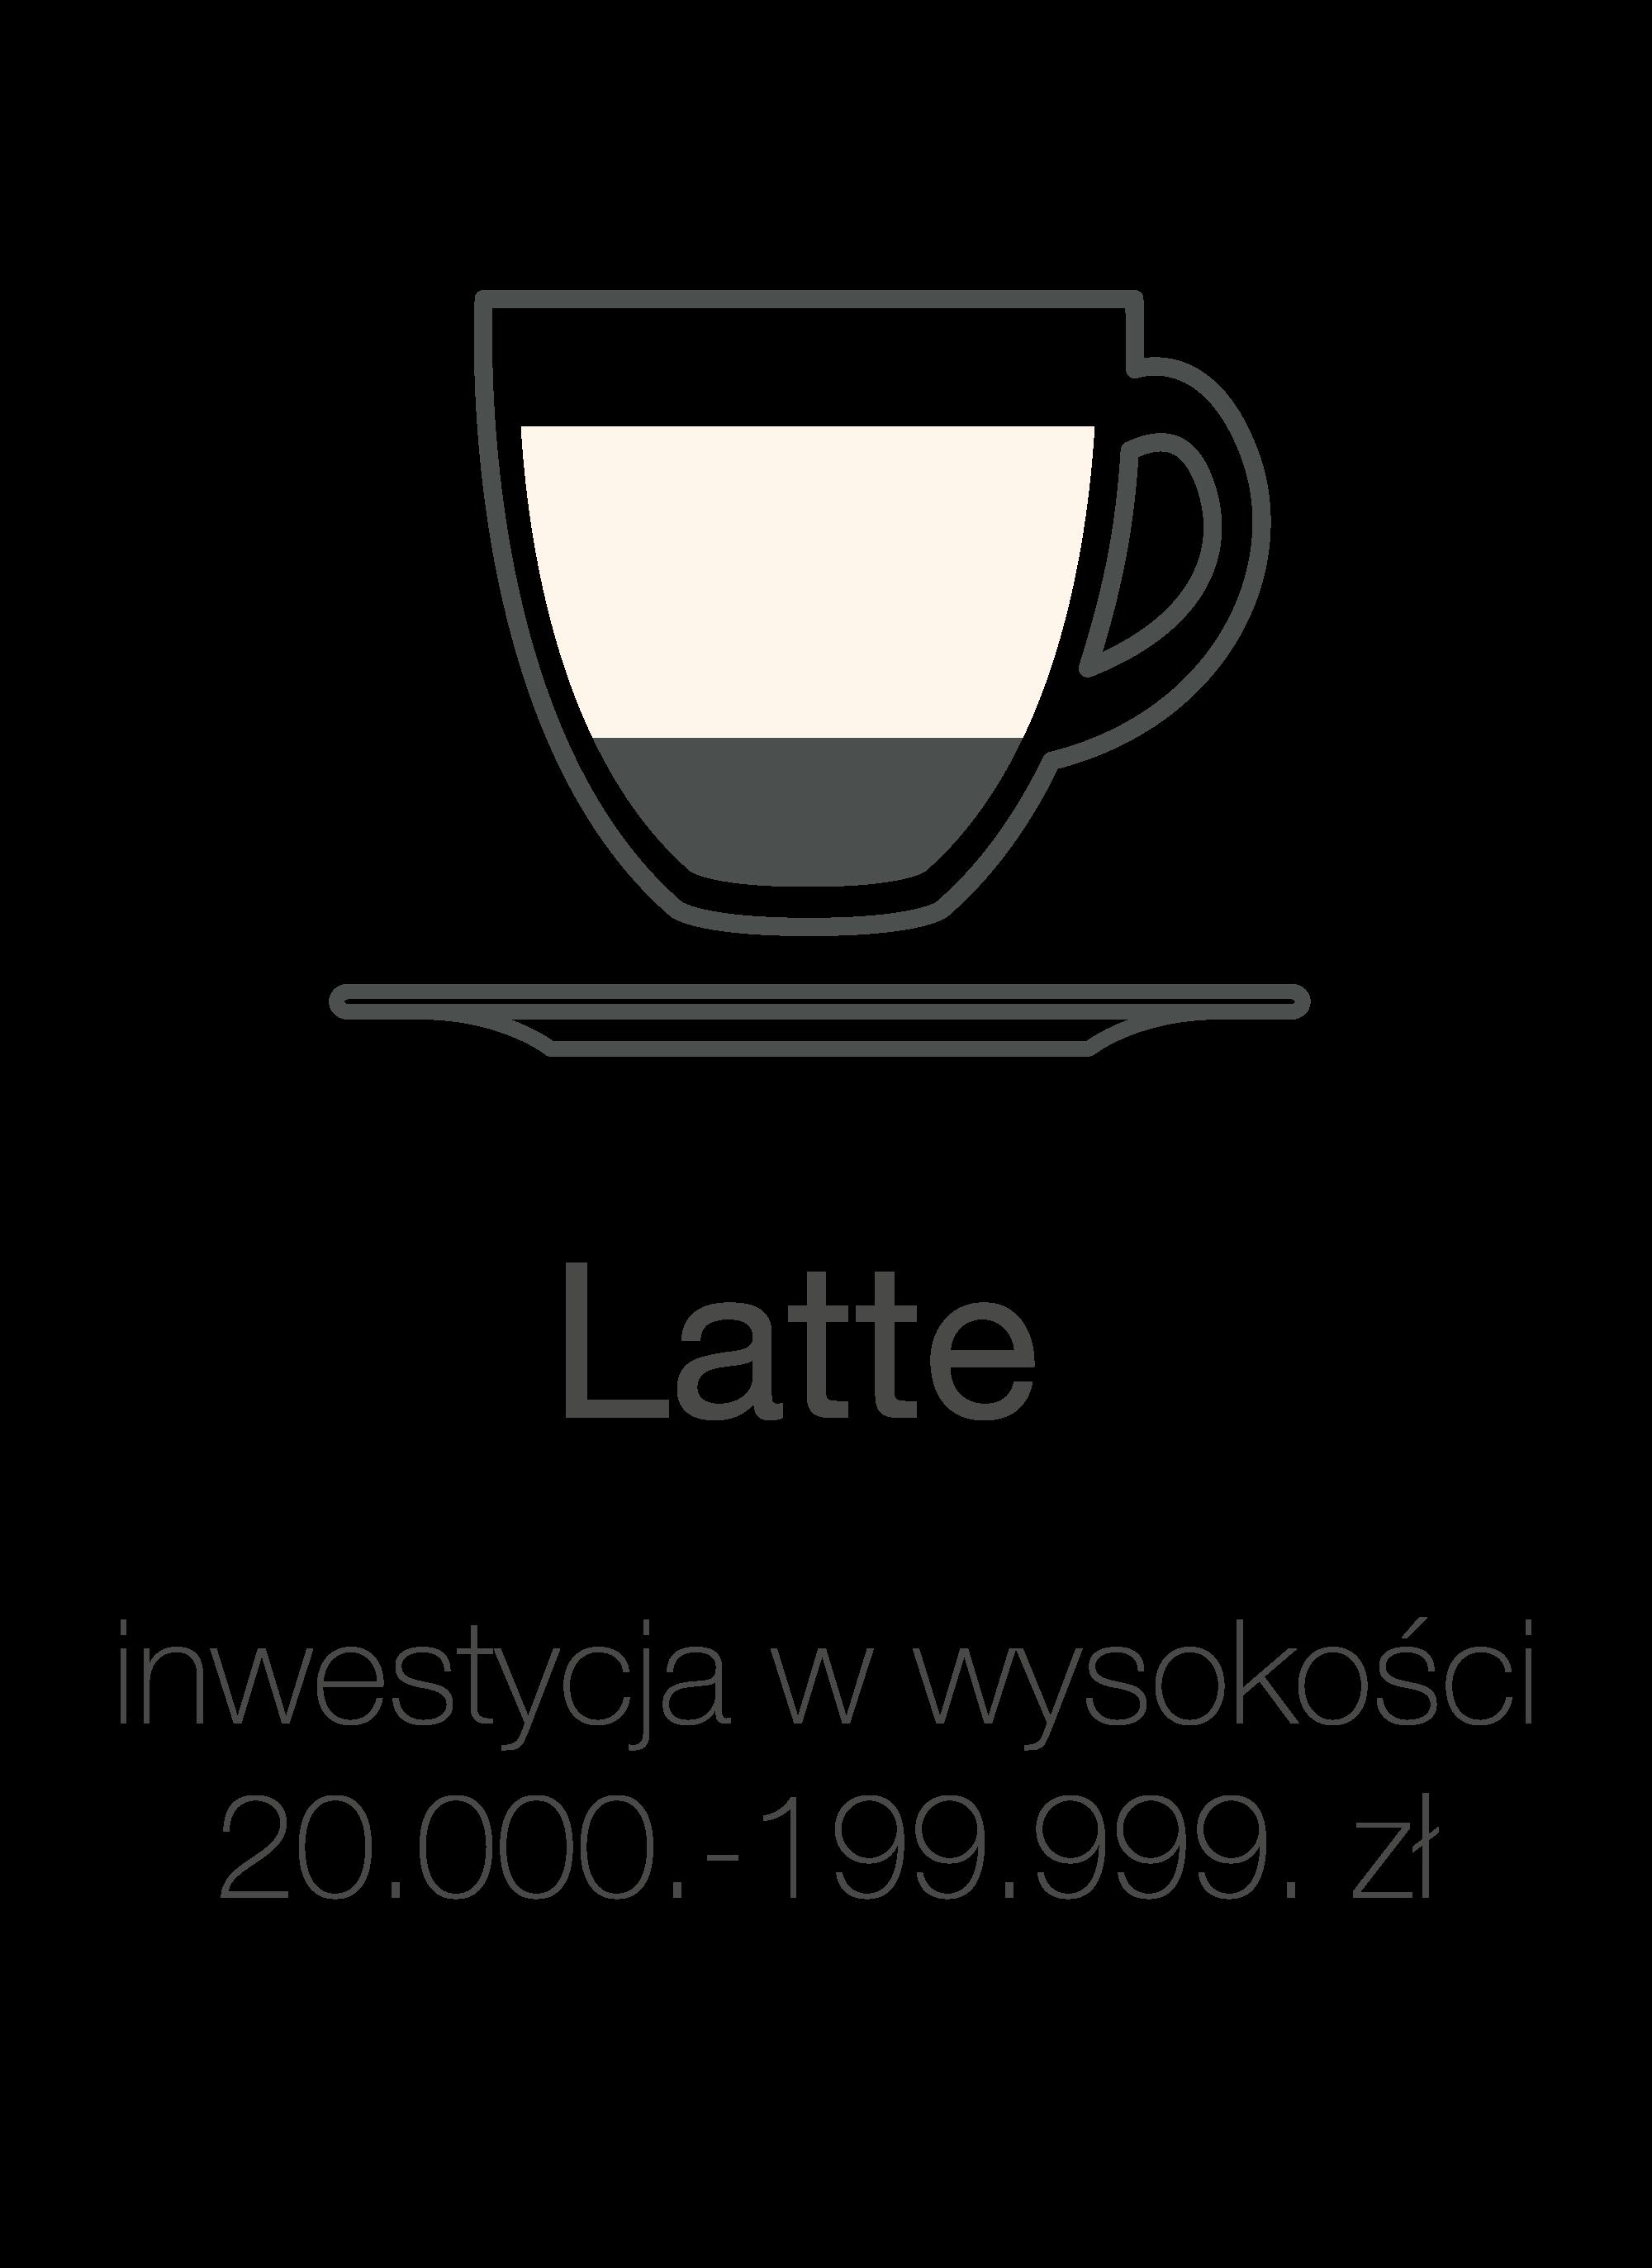 Pakiet Latte Etno Cafe